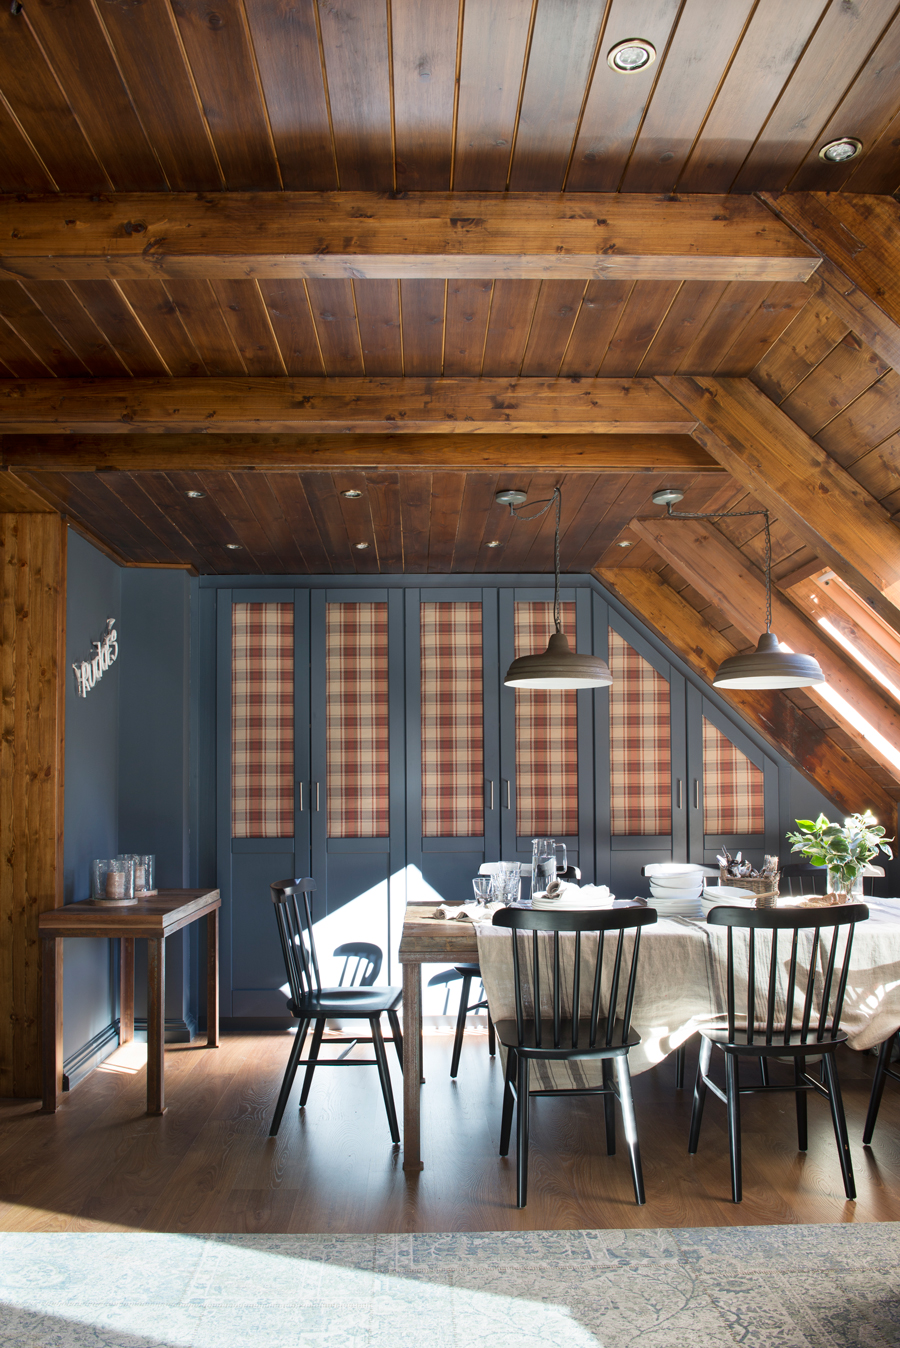 00447308 O. Comedor rústico con techo de madera, pardes en azul oscuro y armarios empotrados entelados con tela a cuadros 00447308 O